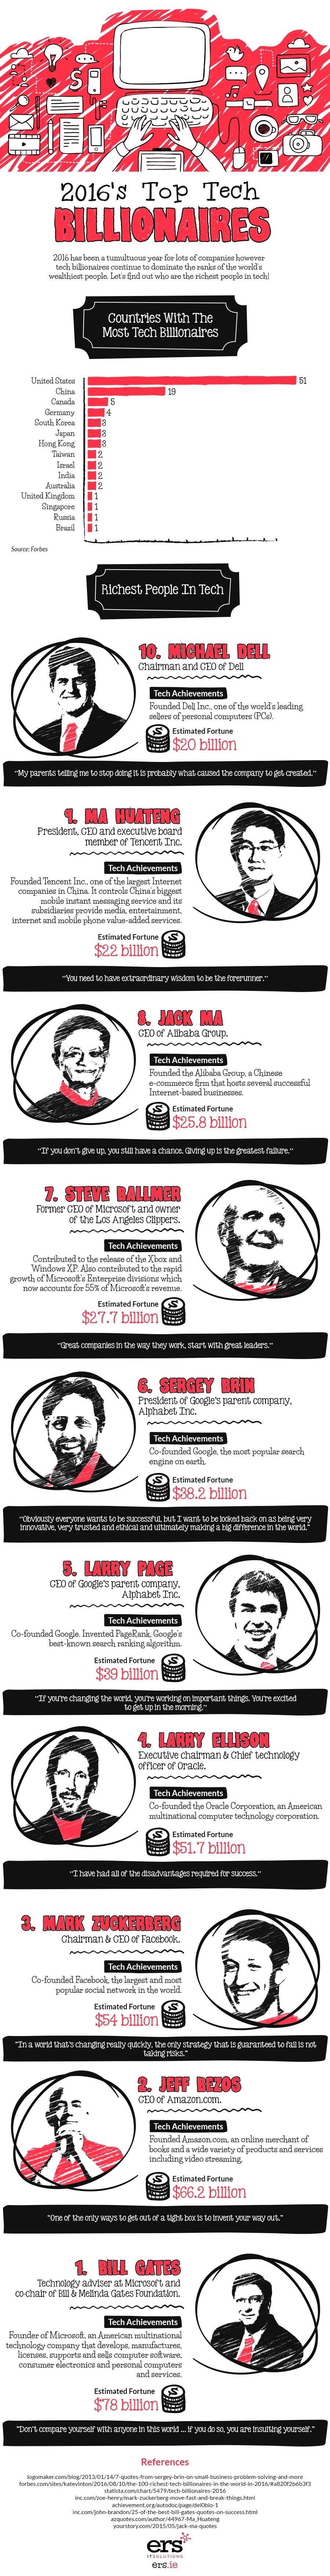 top-tech-billionaires